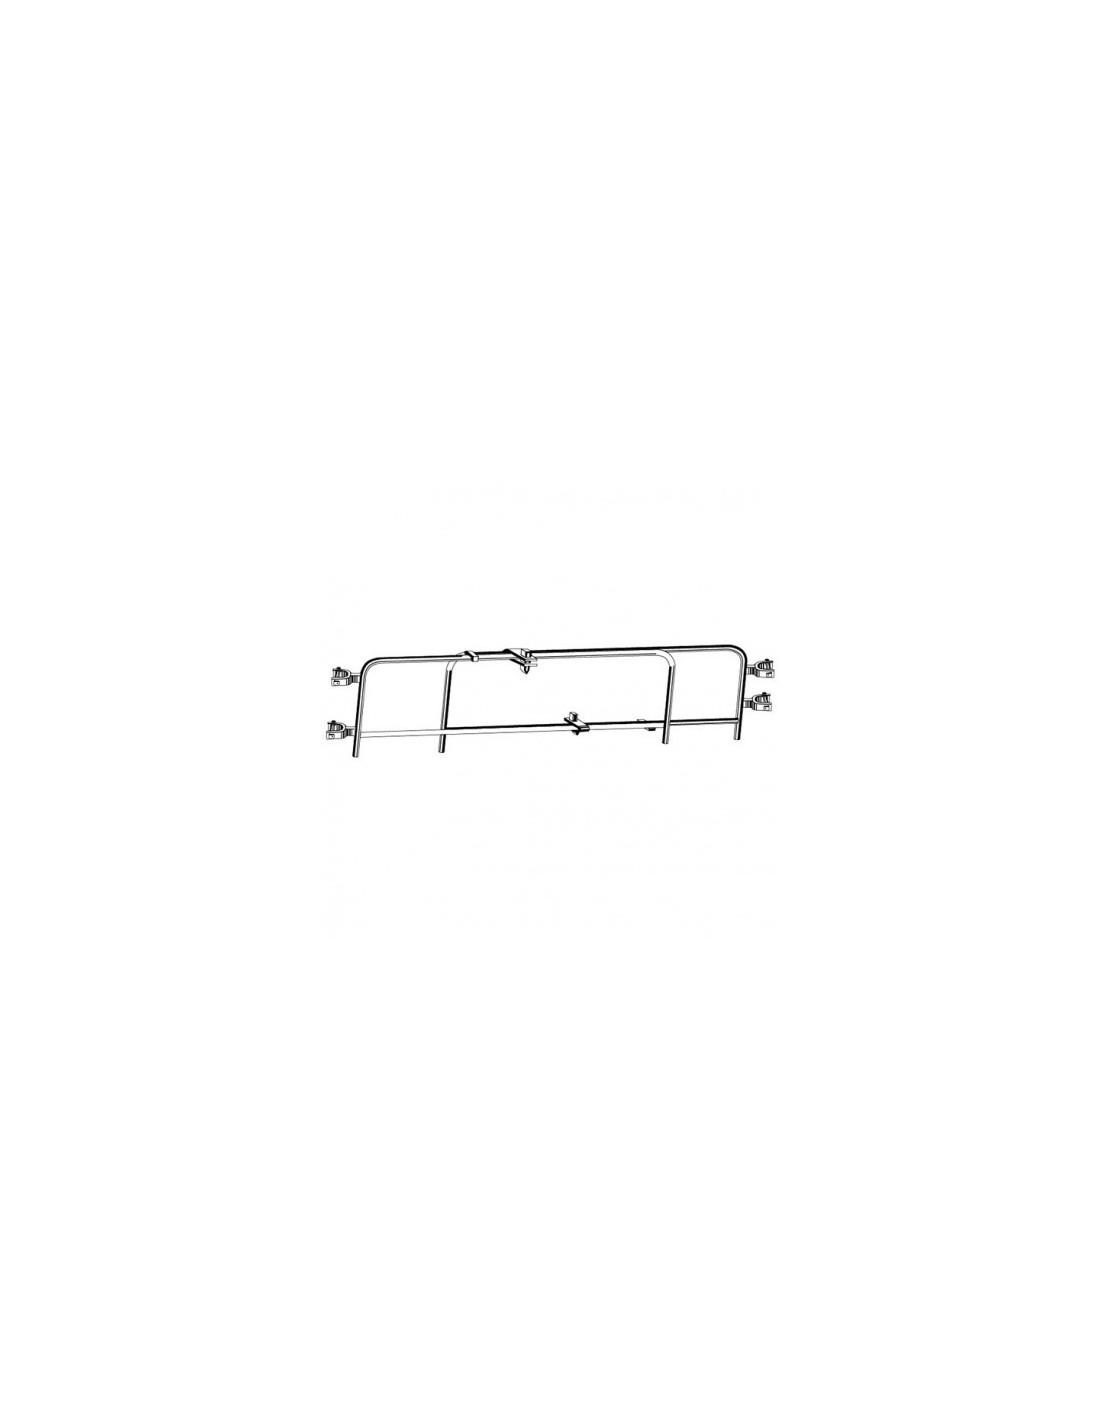 garde corps t lescopique simple 2m 3m50. Black Bedroom Furniture Sets. Home Design Ideas